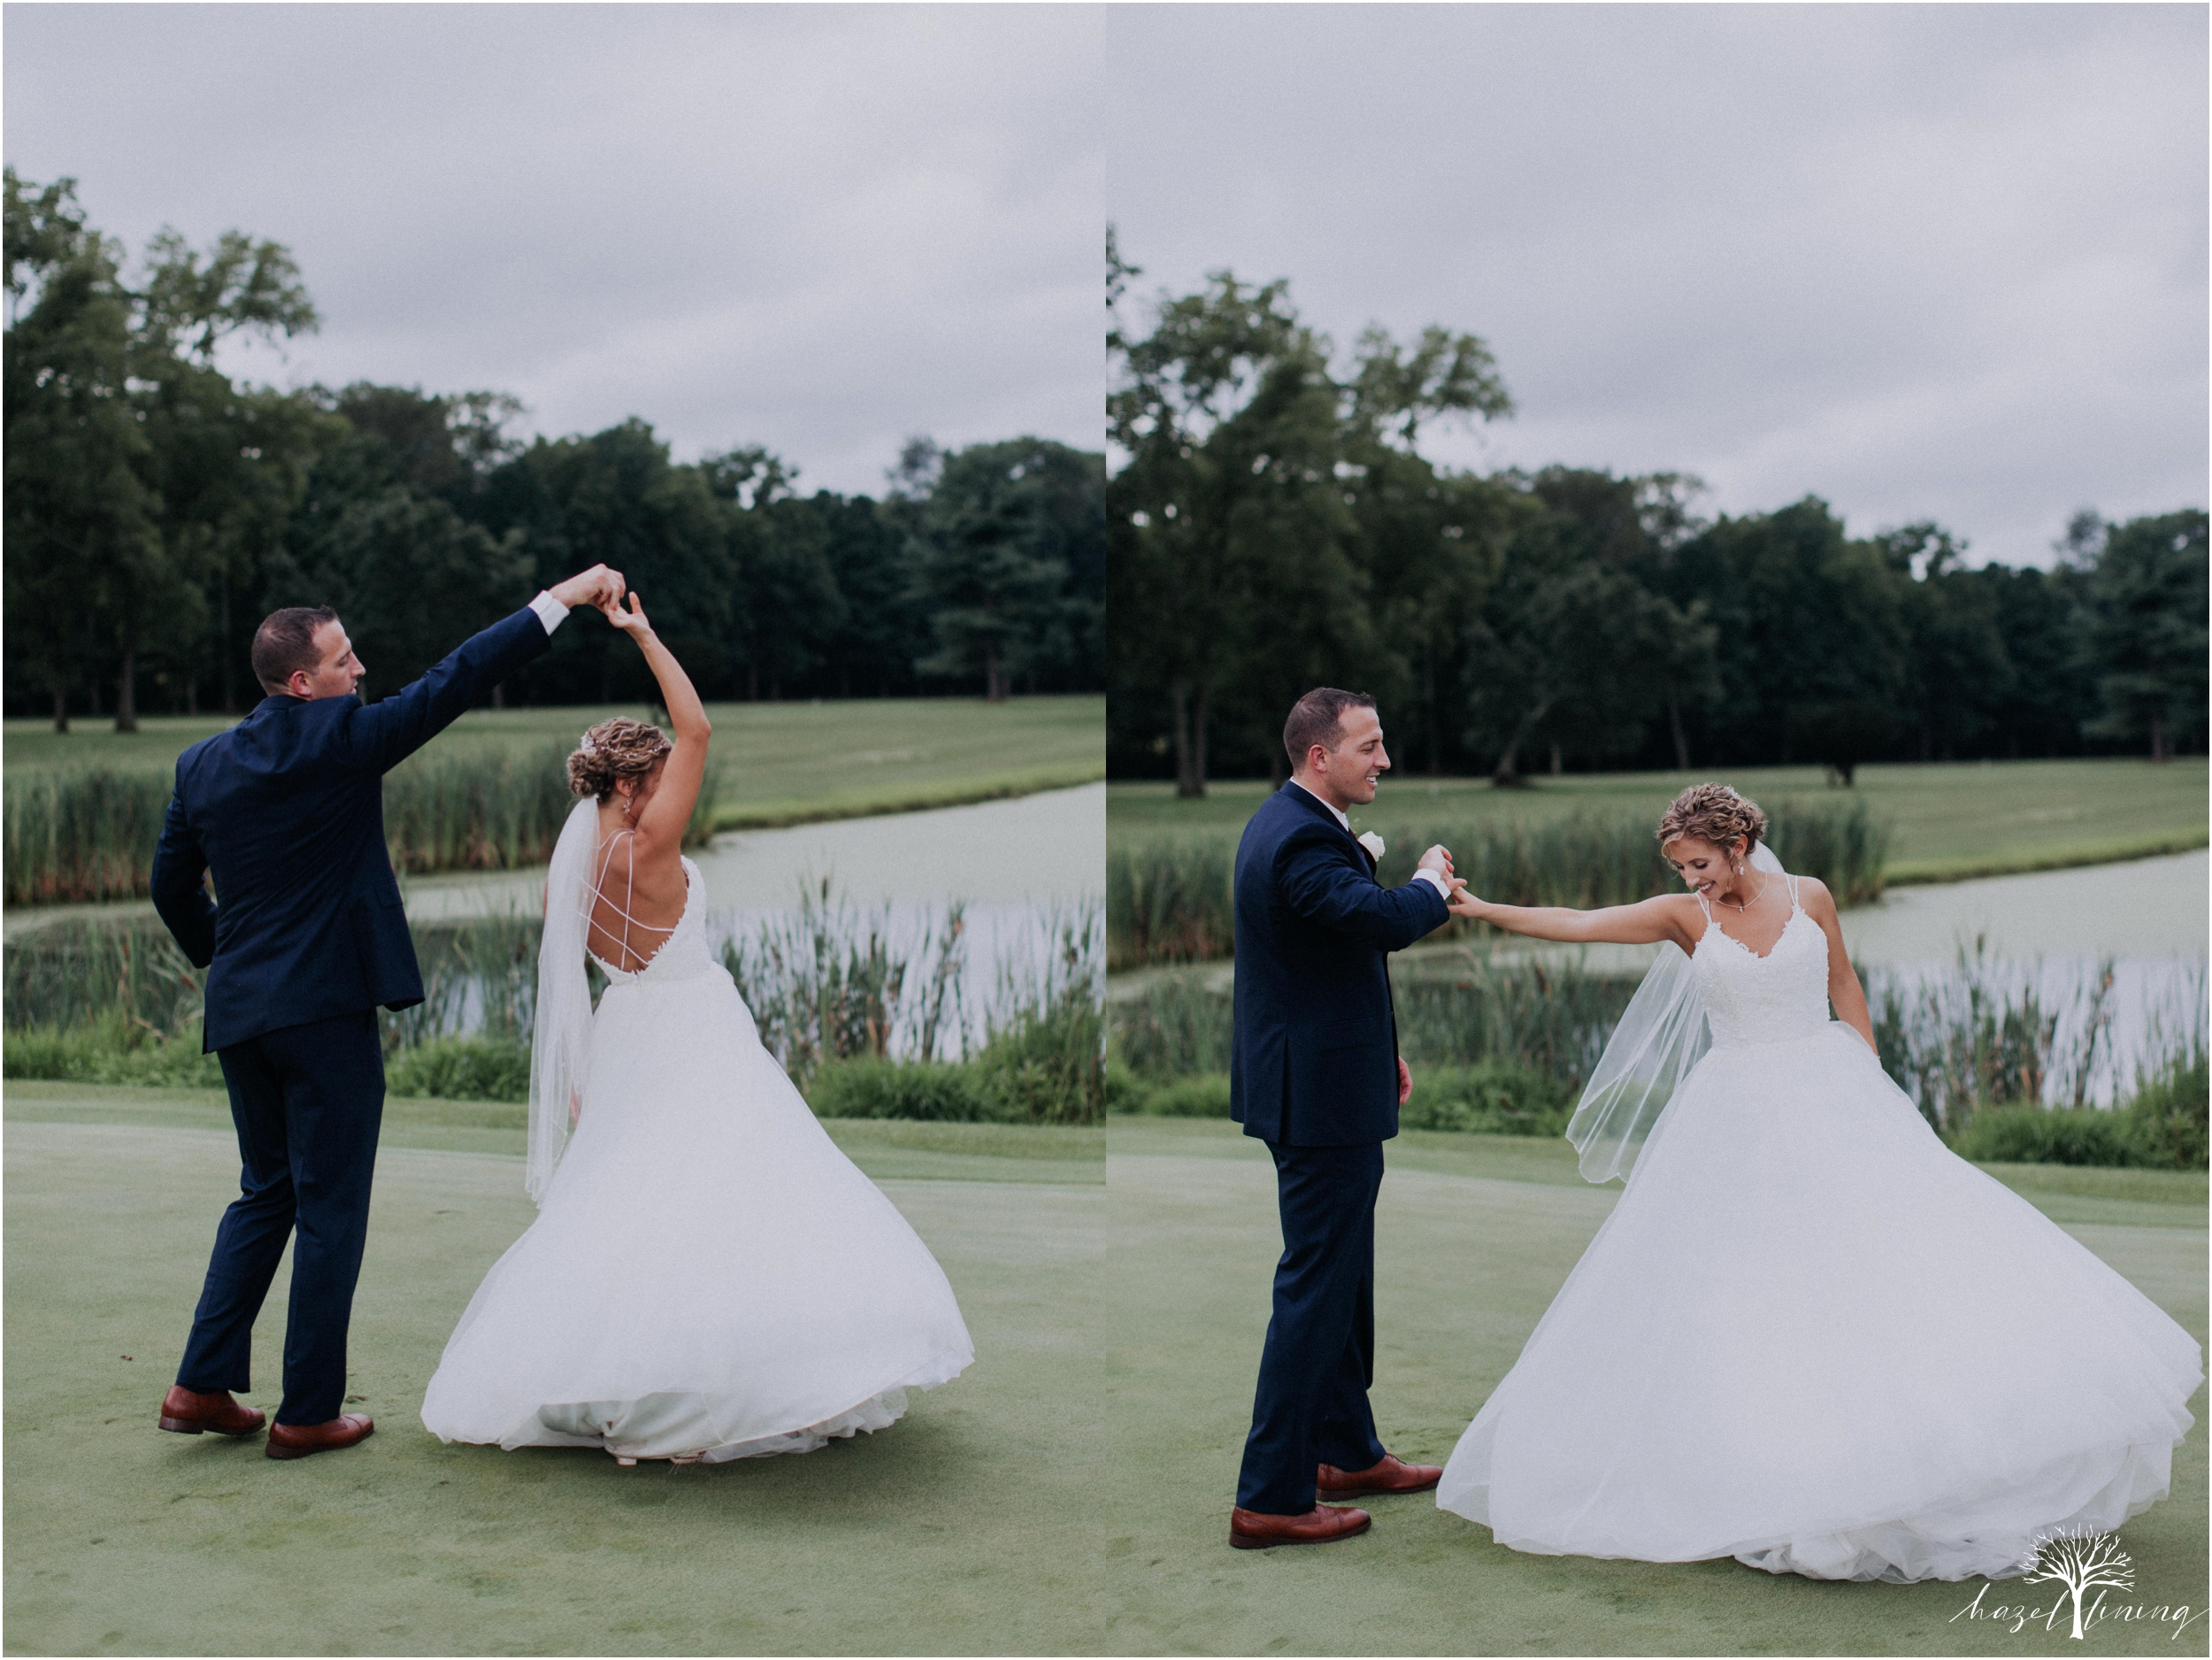 jonathan-weibel-becky-haywood-loft-at-sweetwater-cc-pennsburg-pennsylvania-rainy-day-summer-wedding-hazel-lining-travel-wedding-elopement-photography_0095.jpg